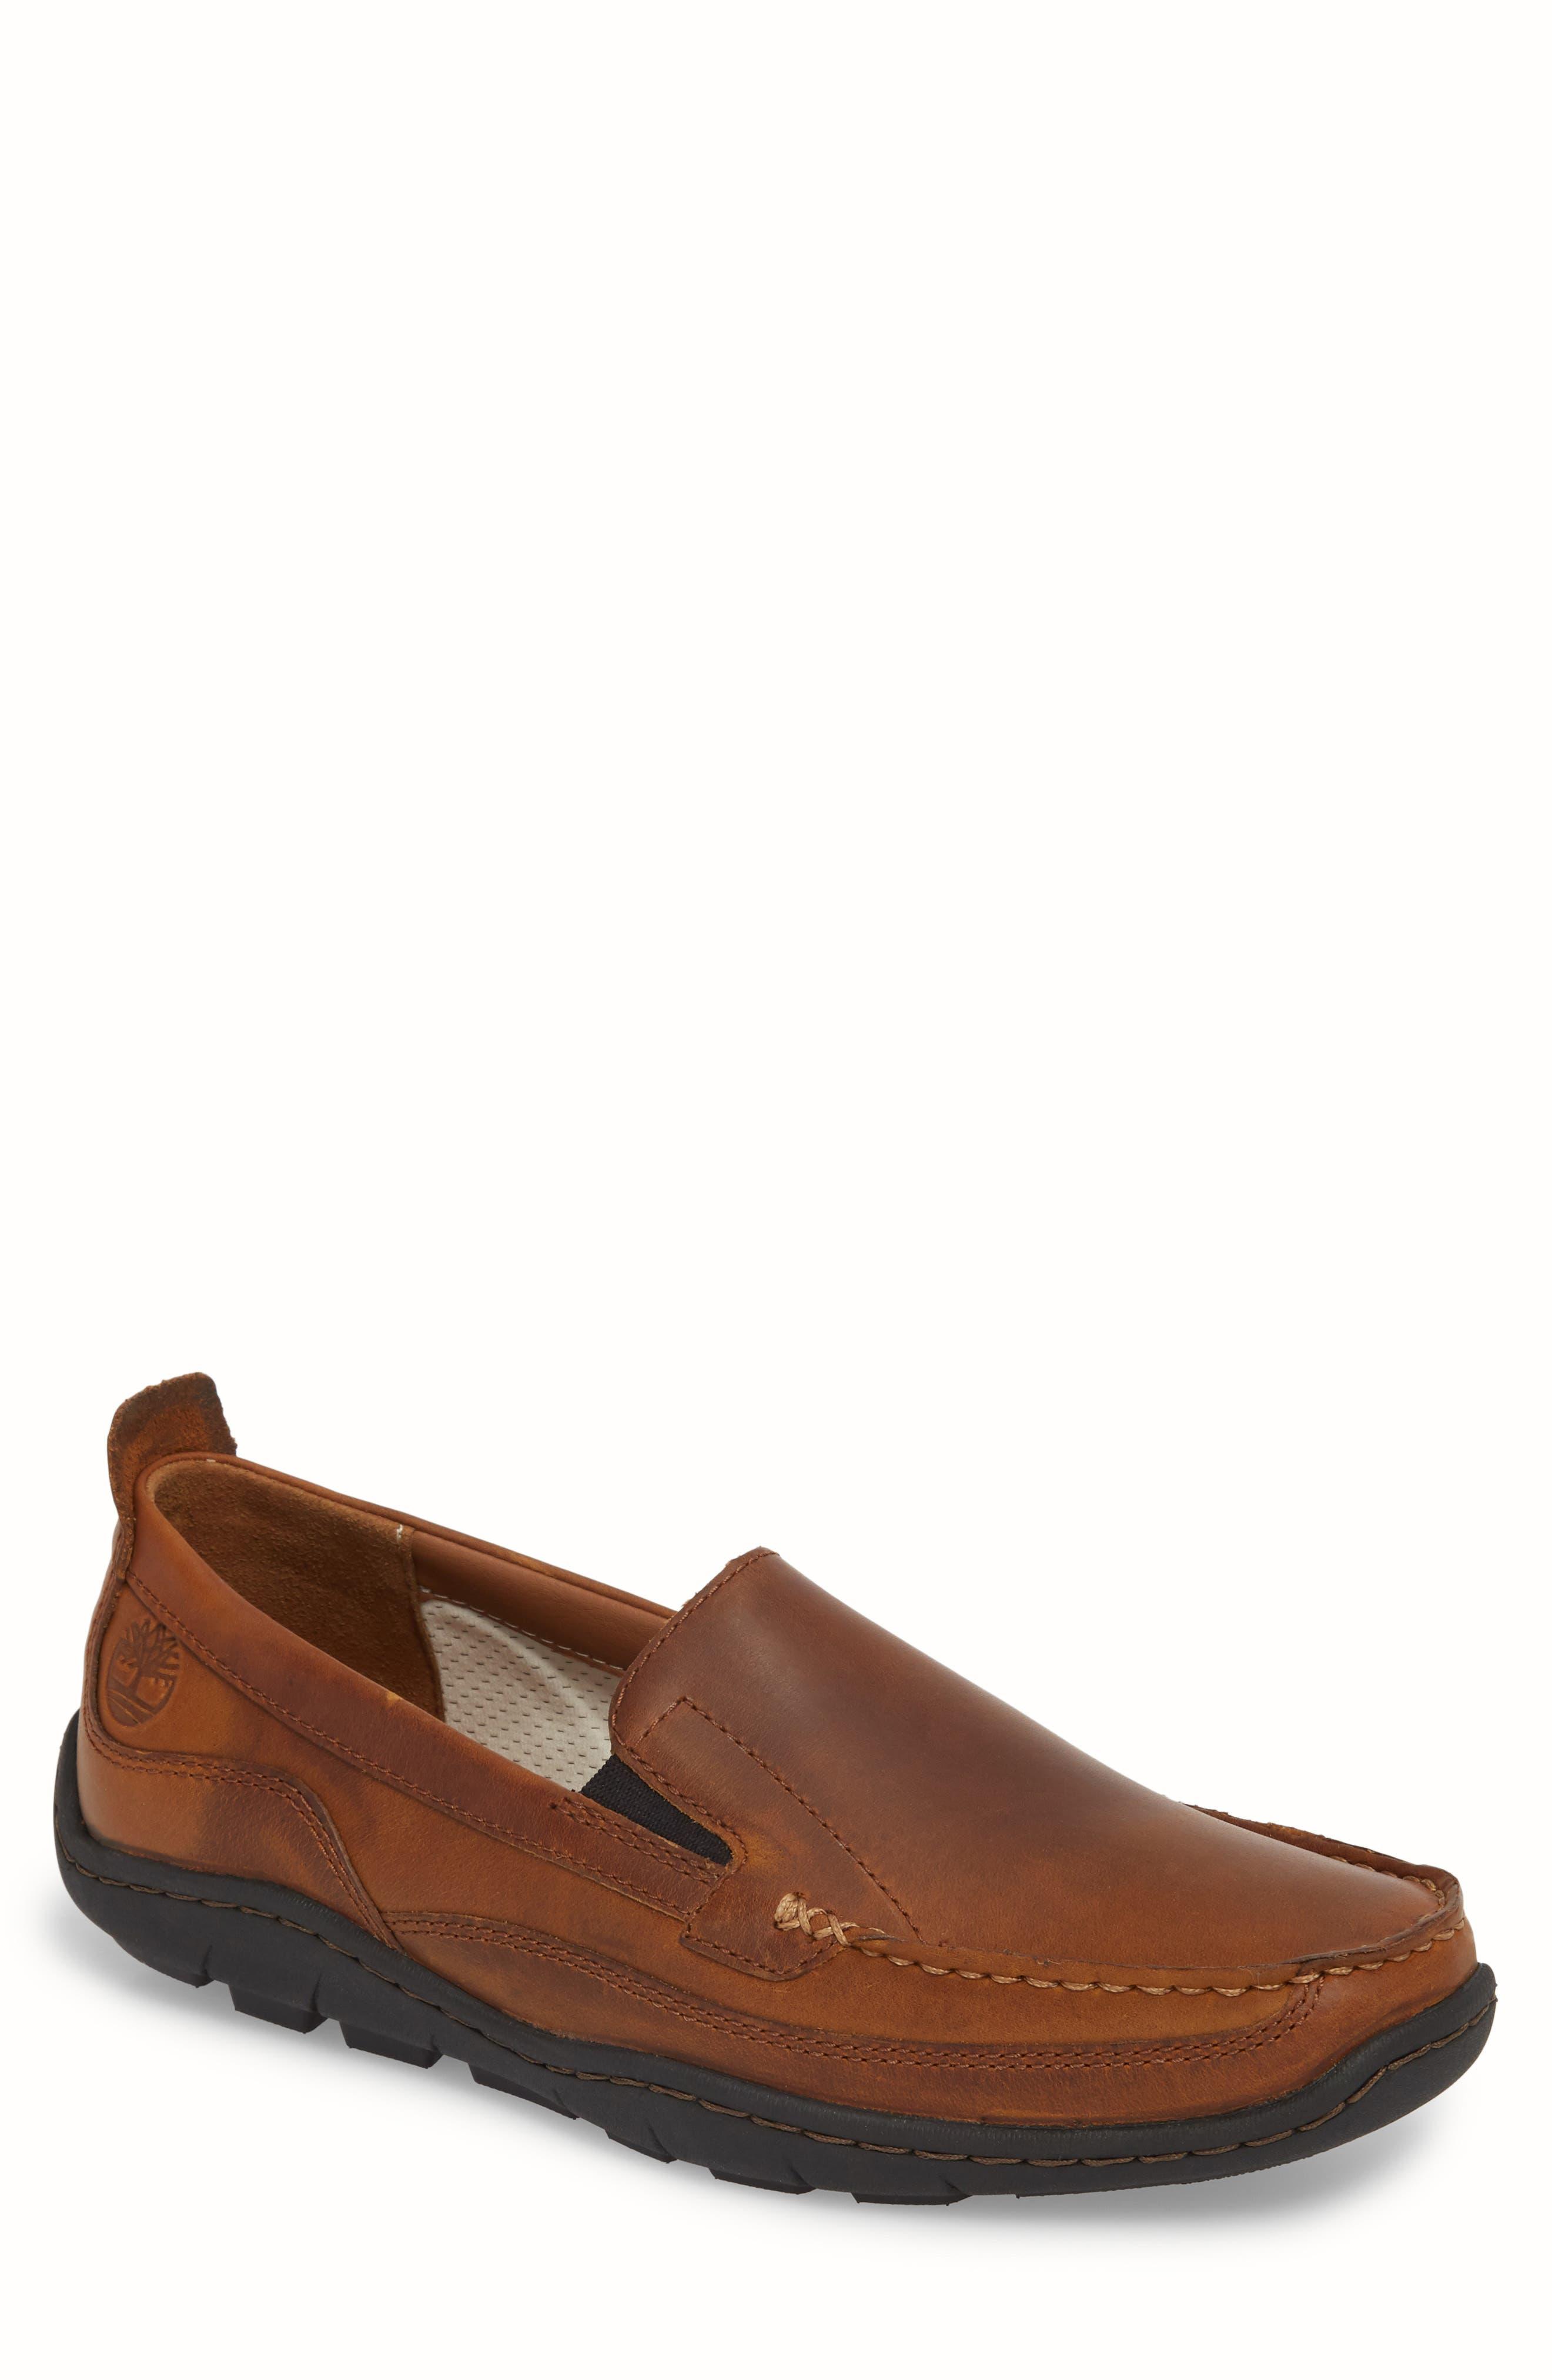 Sandspoint Venetian Loafer,                         Main,                         color, Tan Old Harness